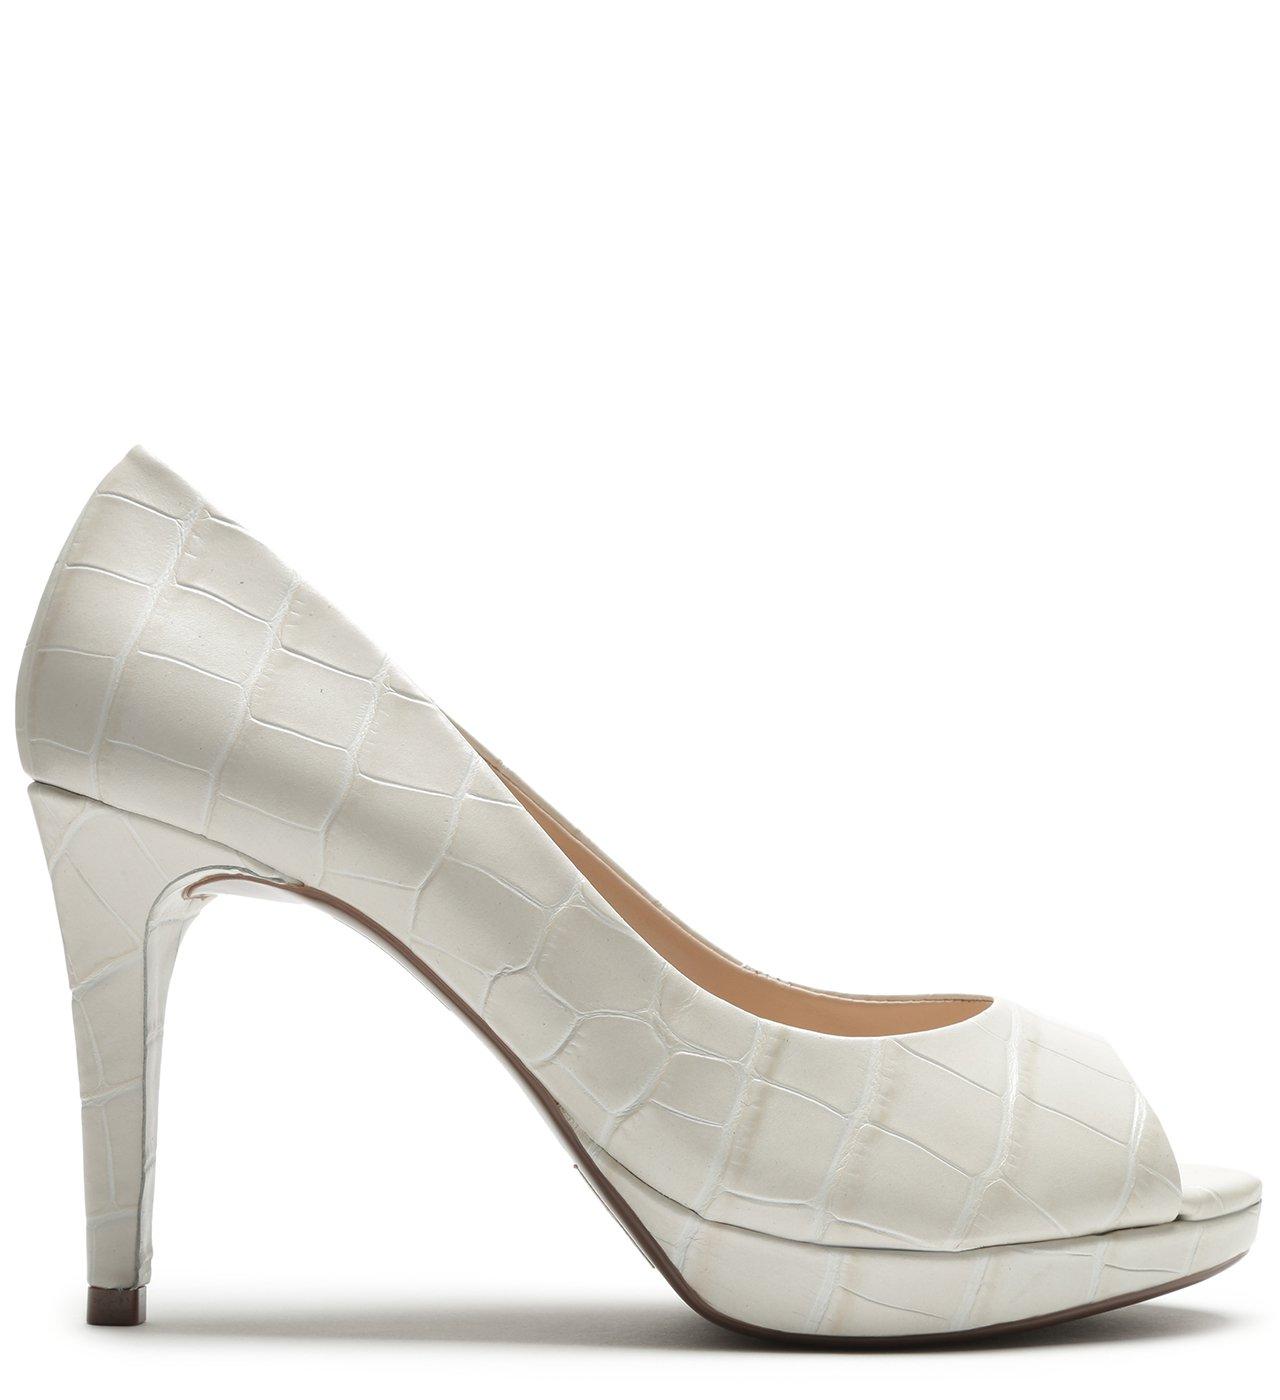 Scarpin Peep Toe Croco Pearl | Schutz